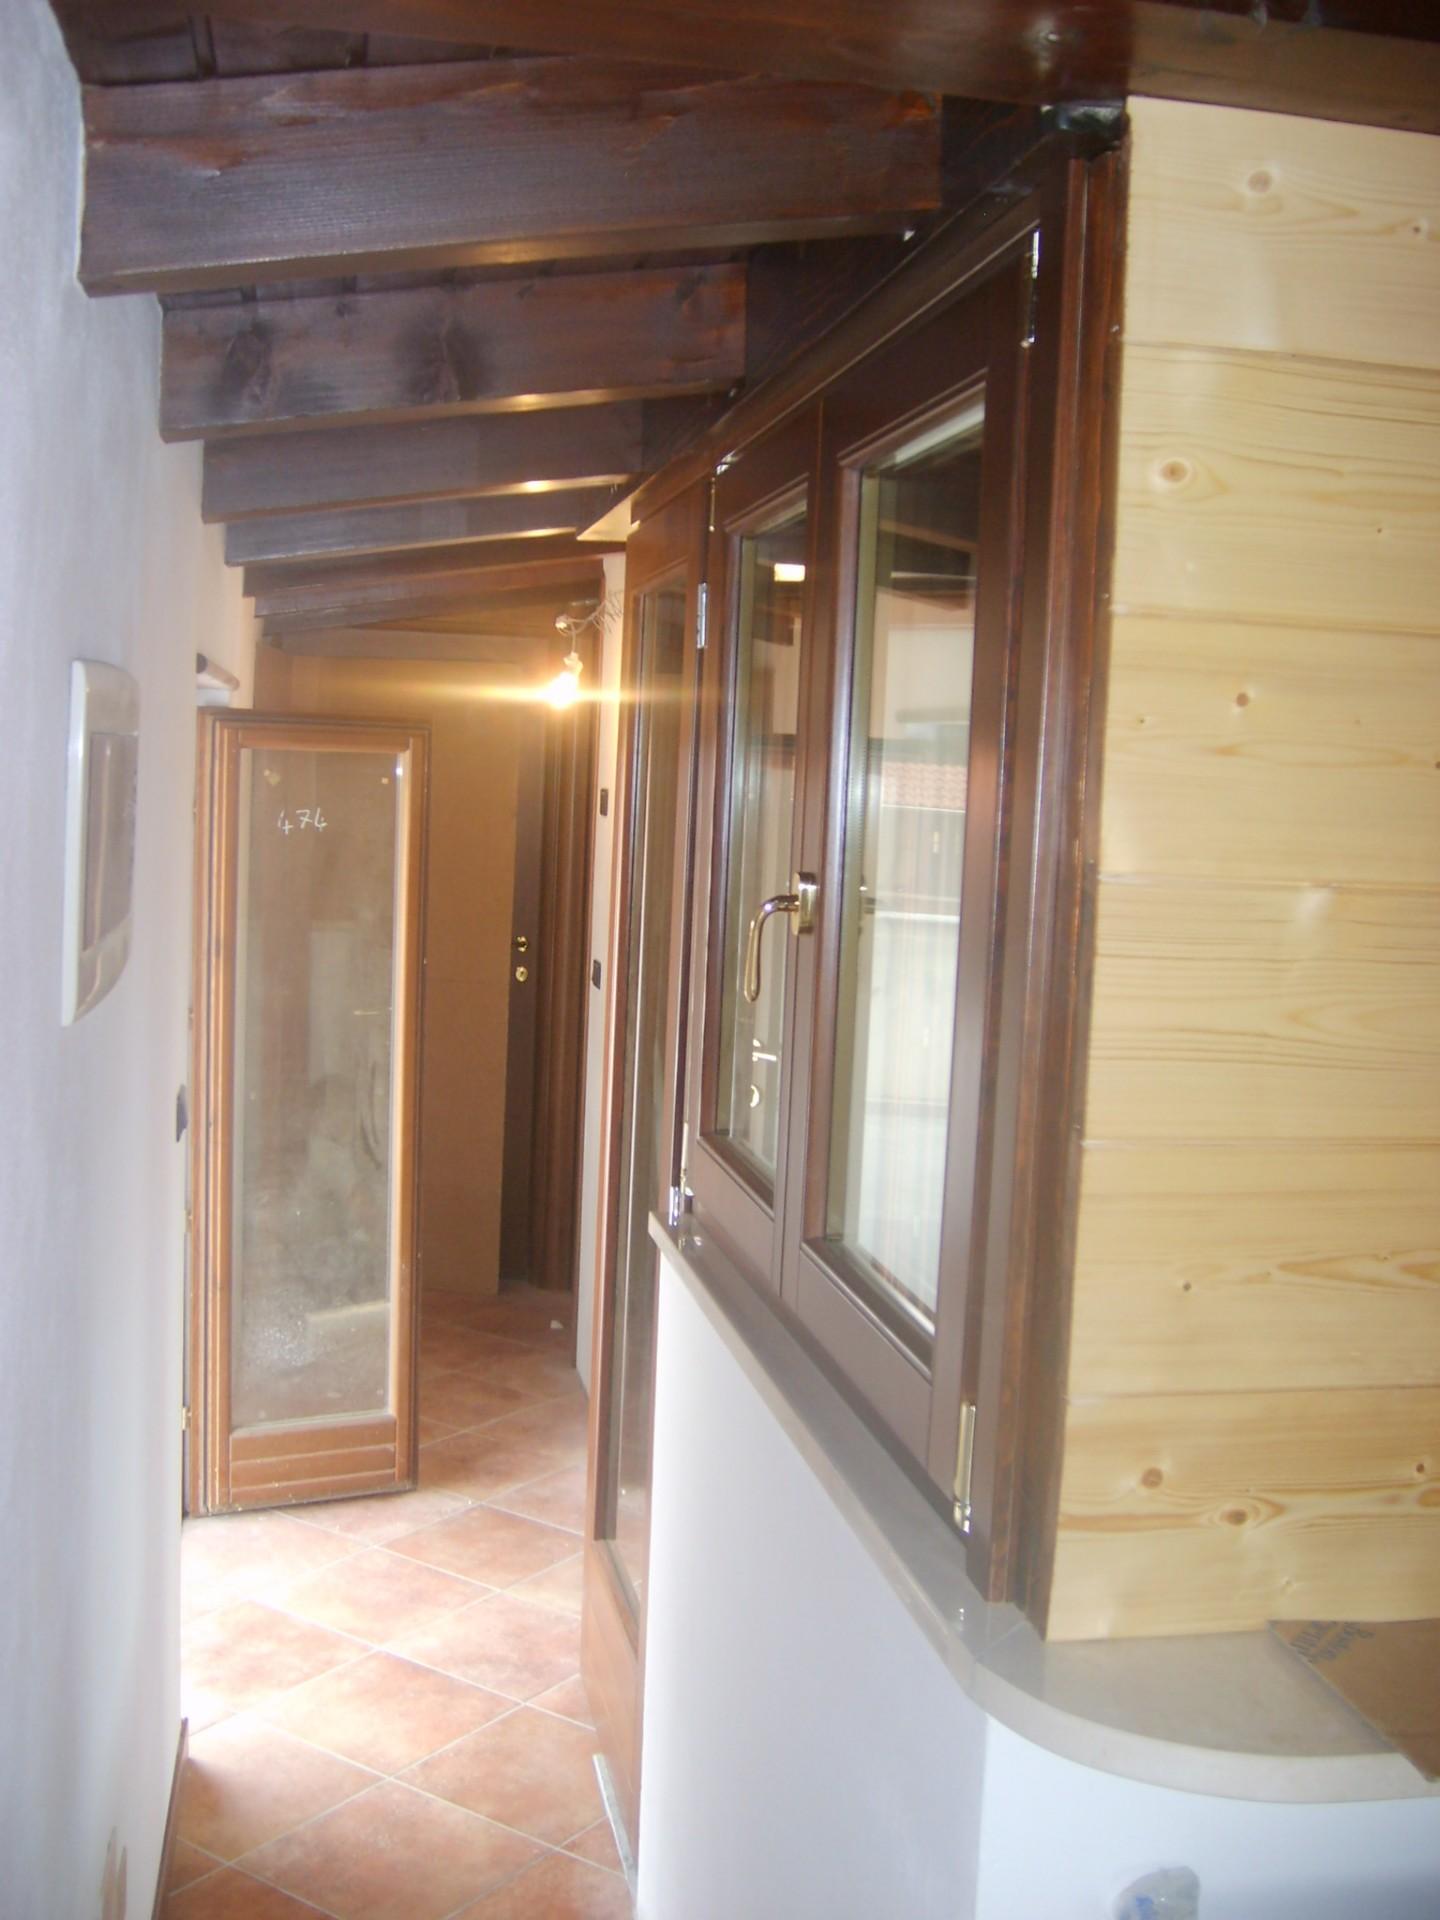 Serramenti in legno pino lamellare 68x80 infix - Finestra a due ante ...